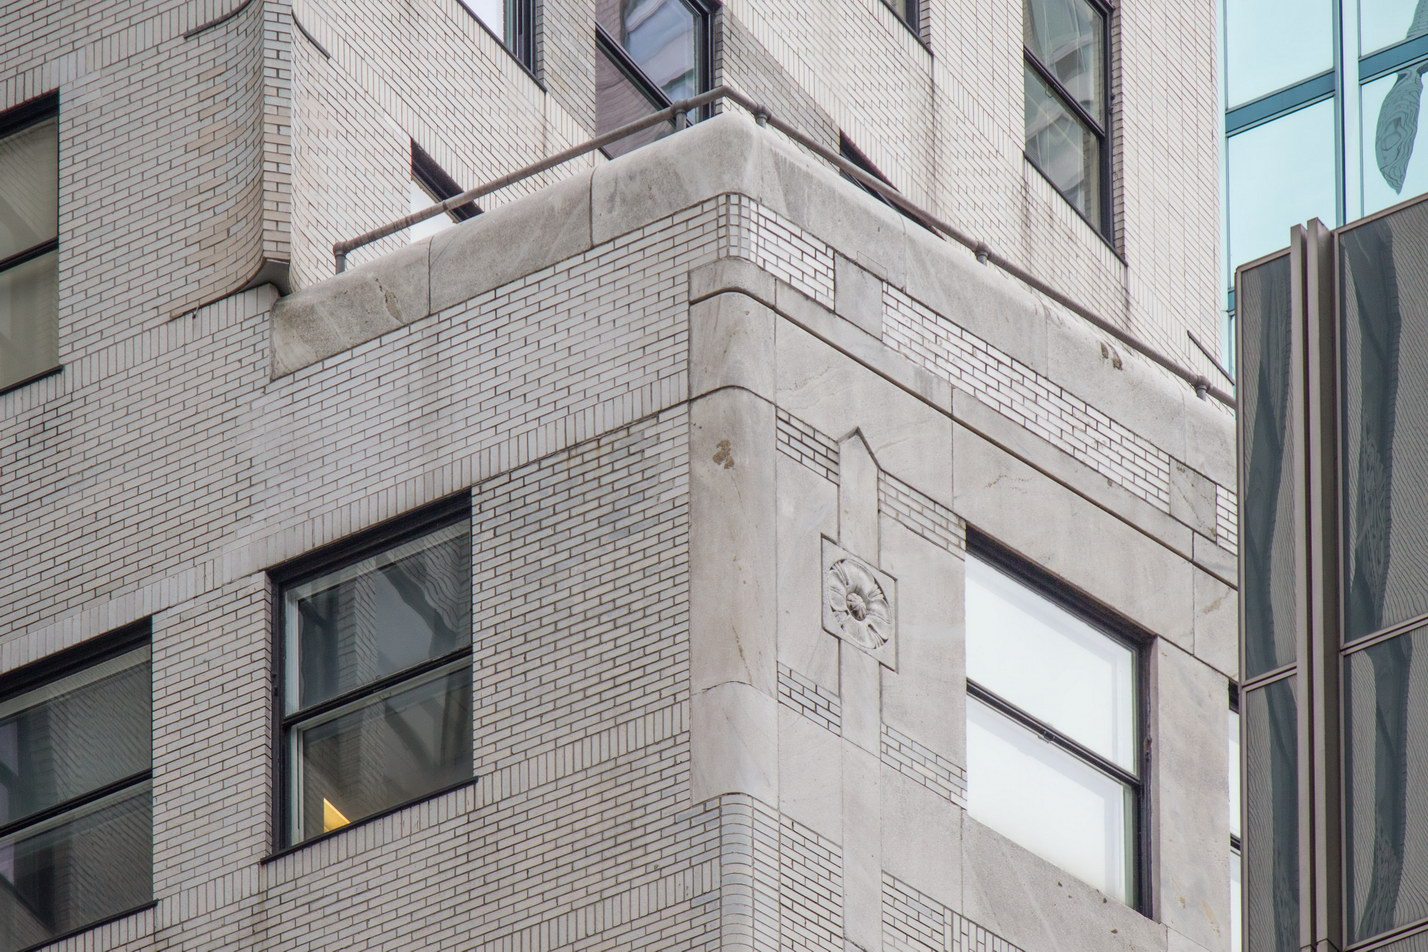 [Chrysler Building] IMG_0083 [8/27/2012 10:44:30 AM]